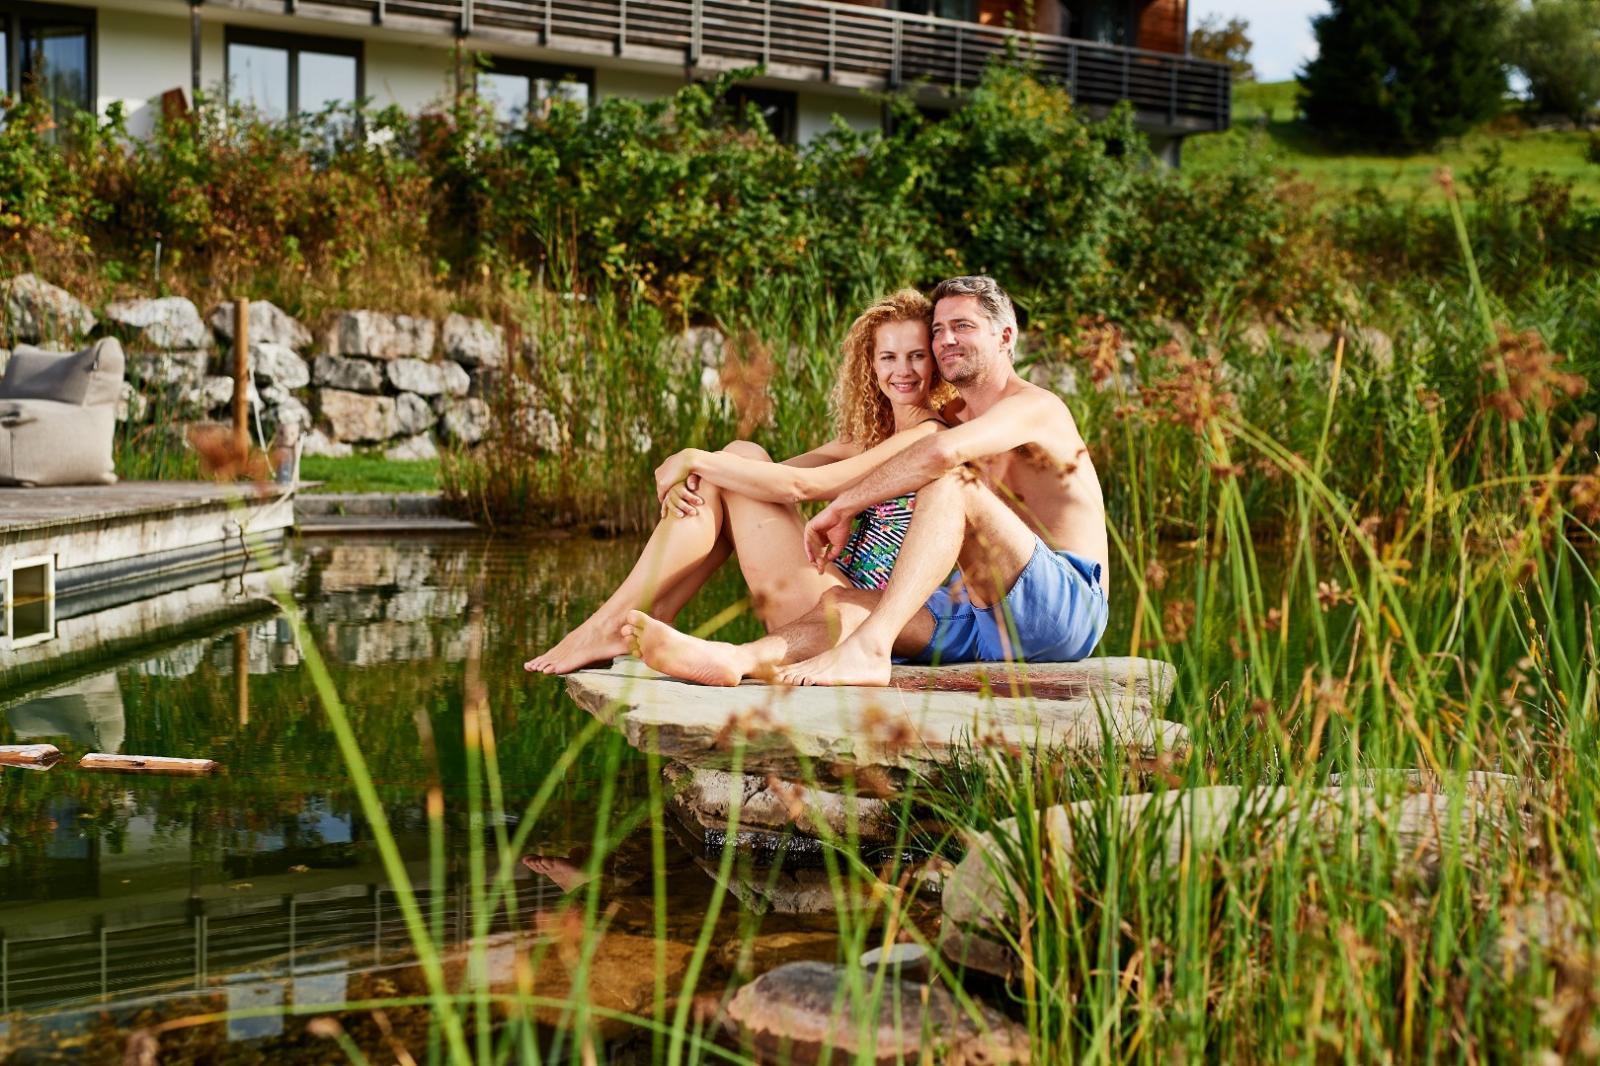 Balneotherapie: Foto vom Wellnesshotel Hotel Oberstdorf | Wellness Bayern